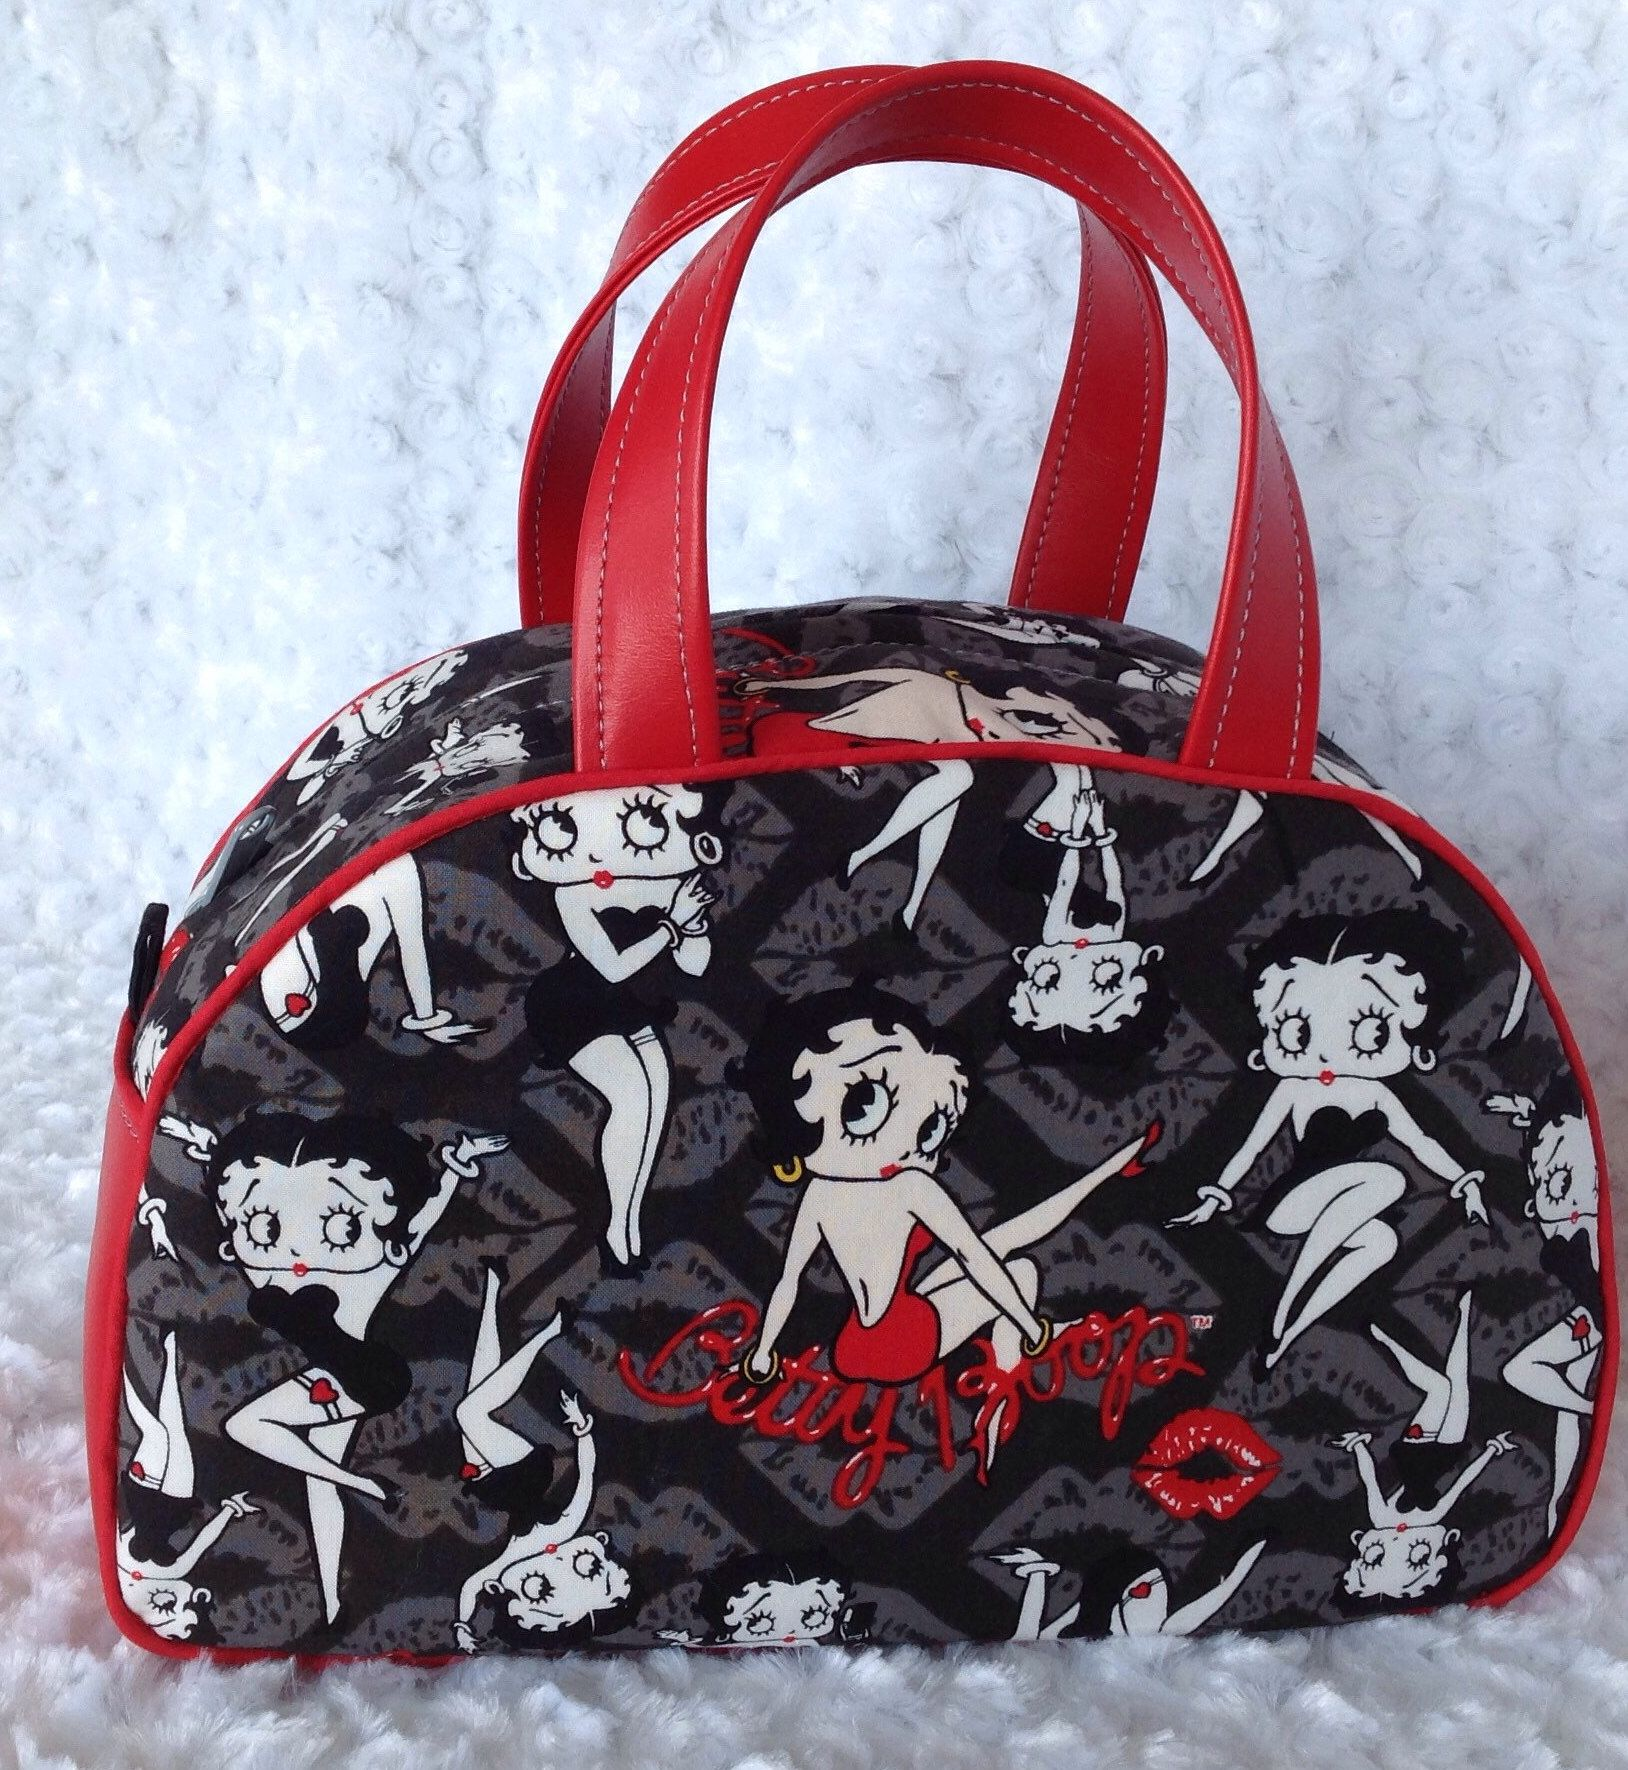 Betty Boop Black Crock Bag Designer